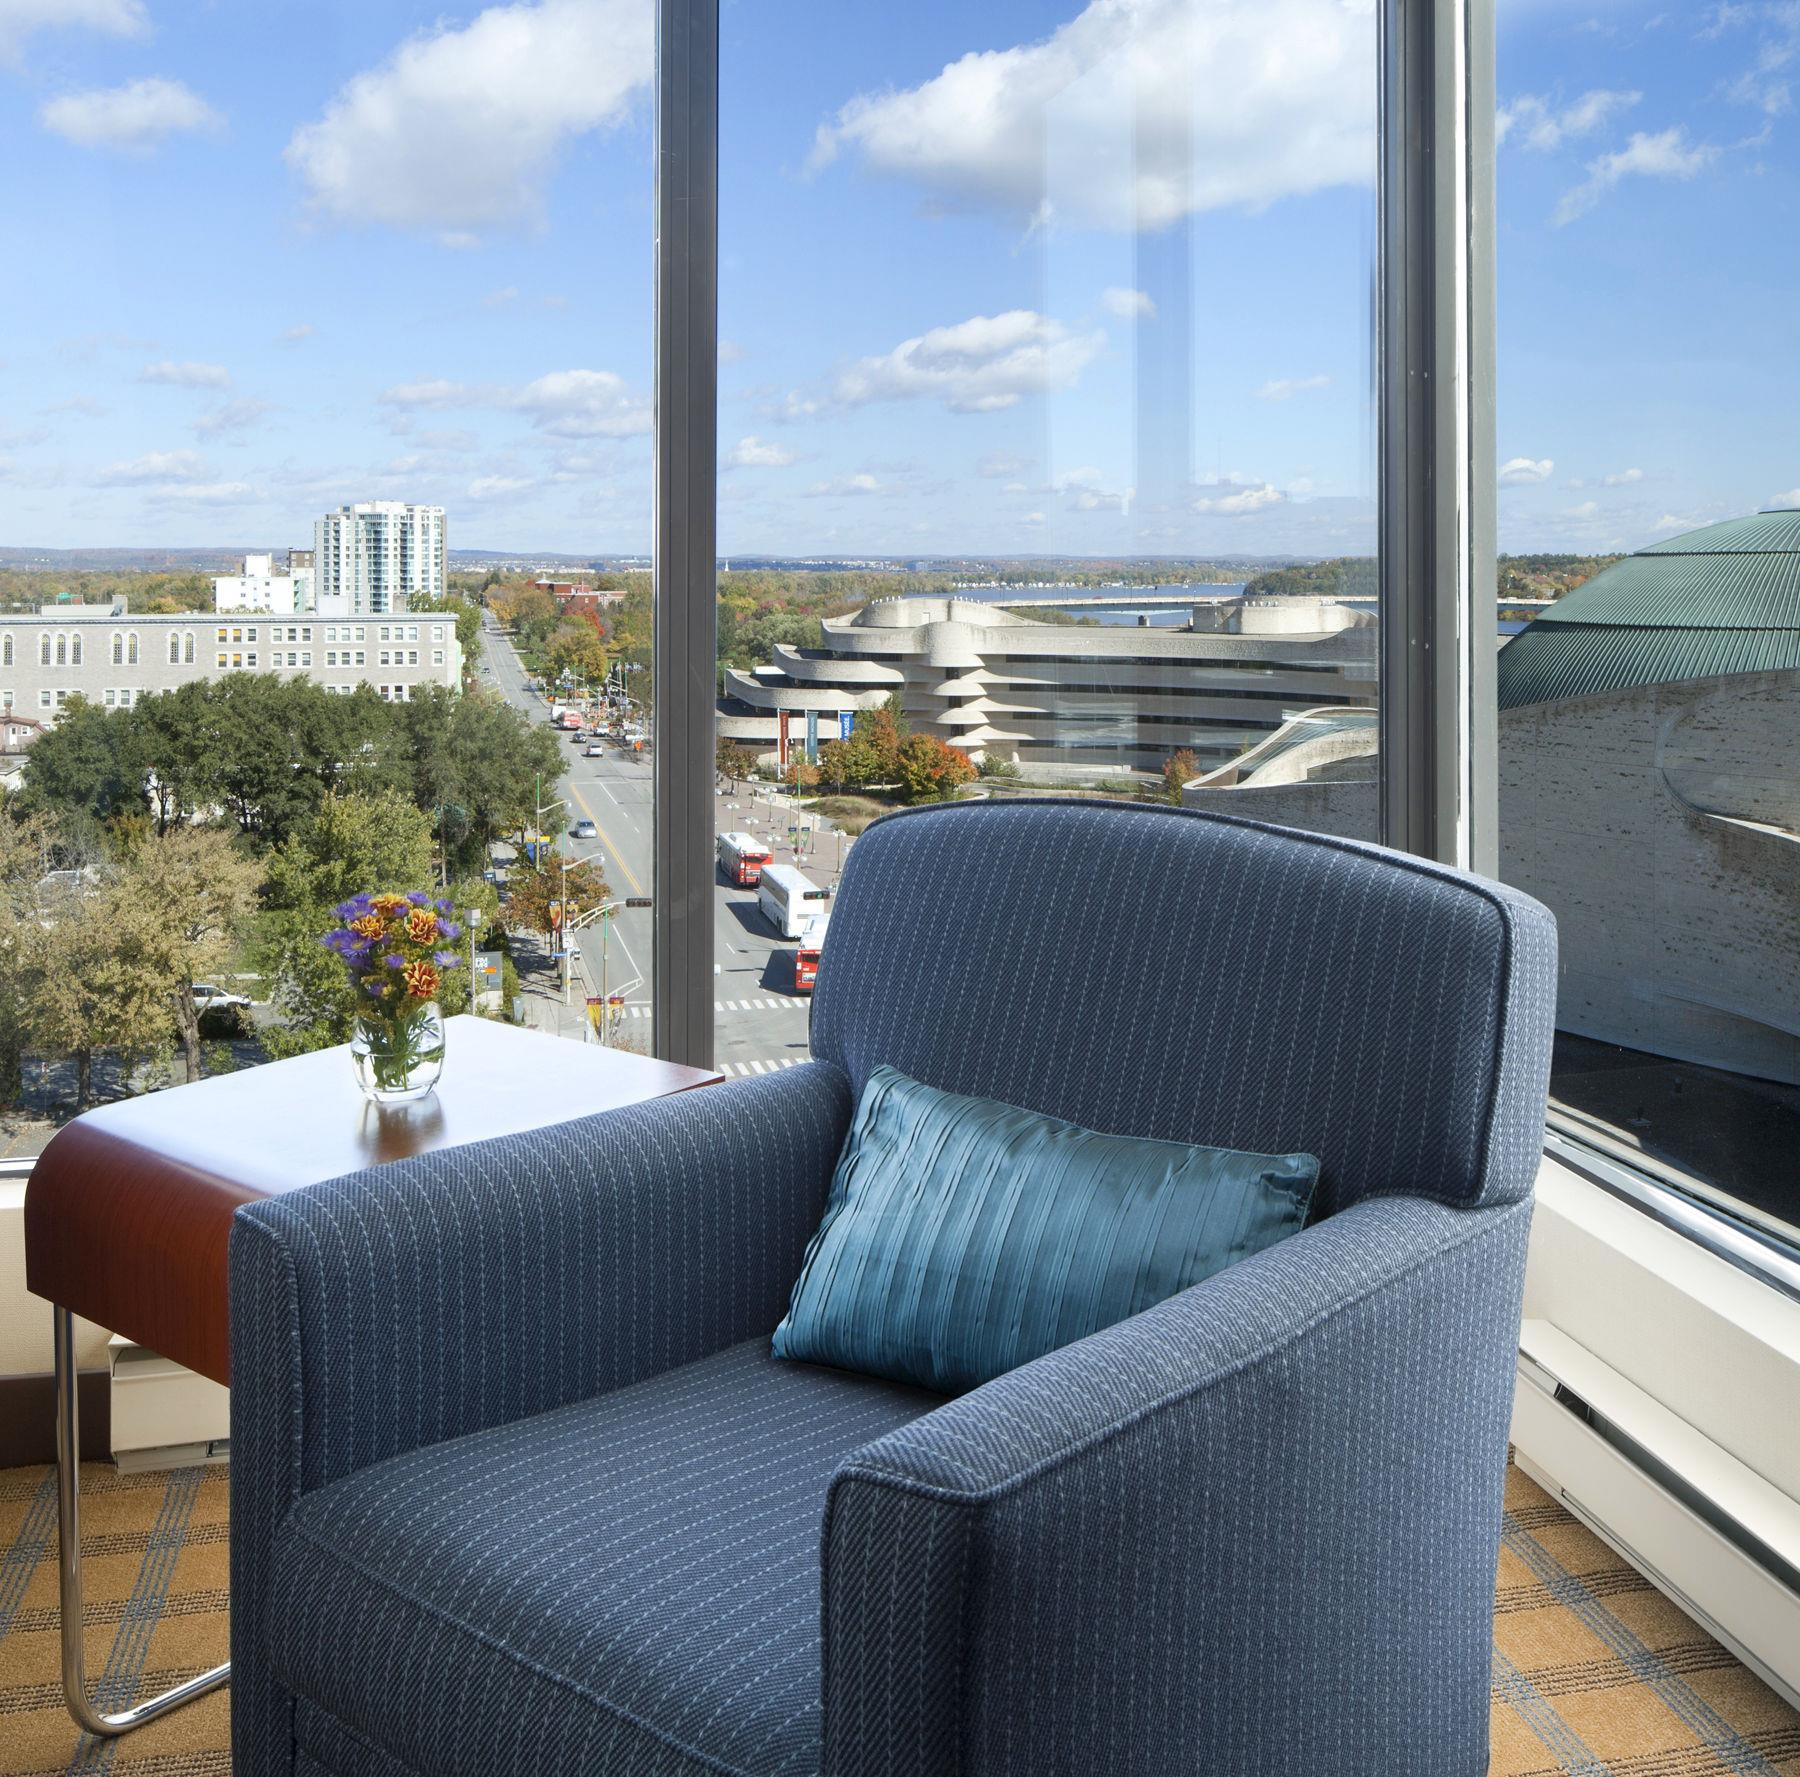 Four Points by Sheraton Hotel & Conference Centre Gatineau-Ottawa à Gatineau: Corner King Executive